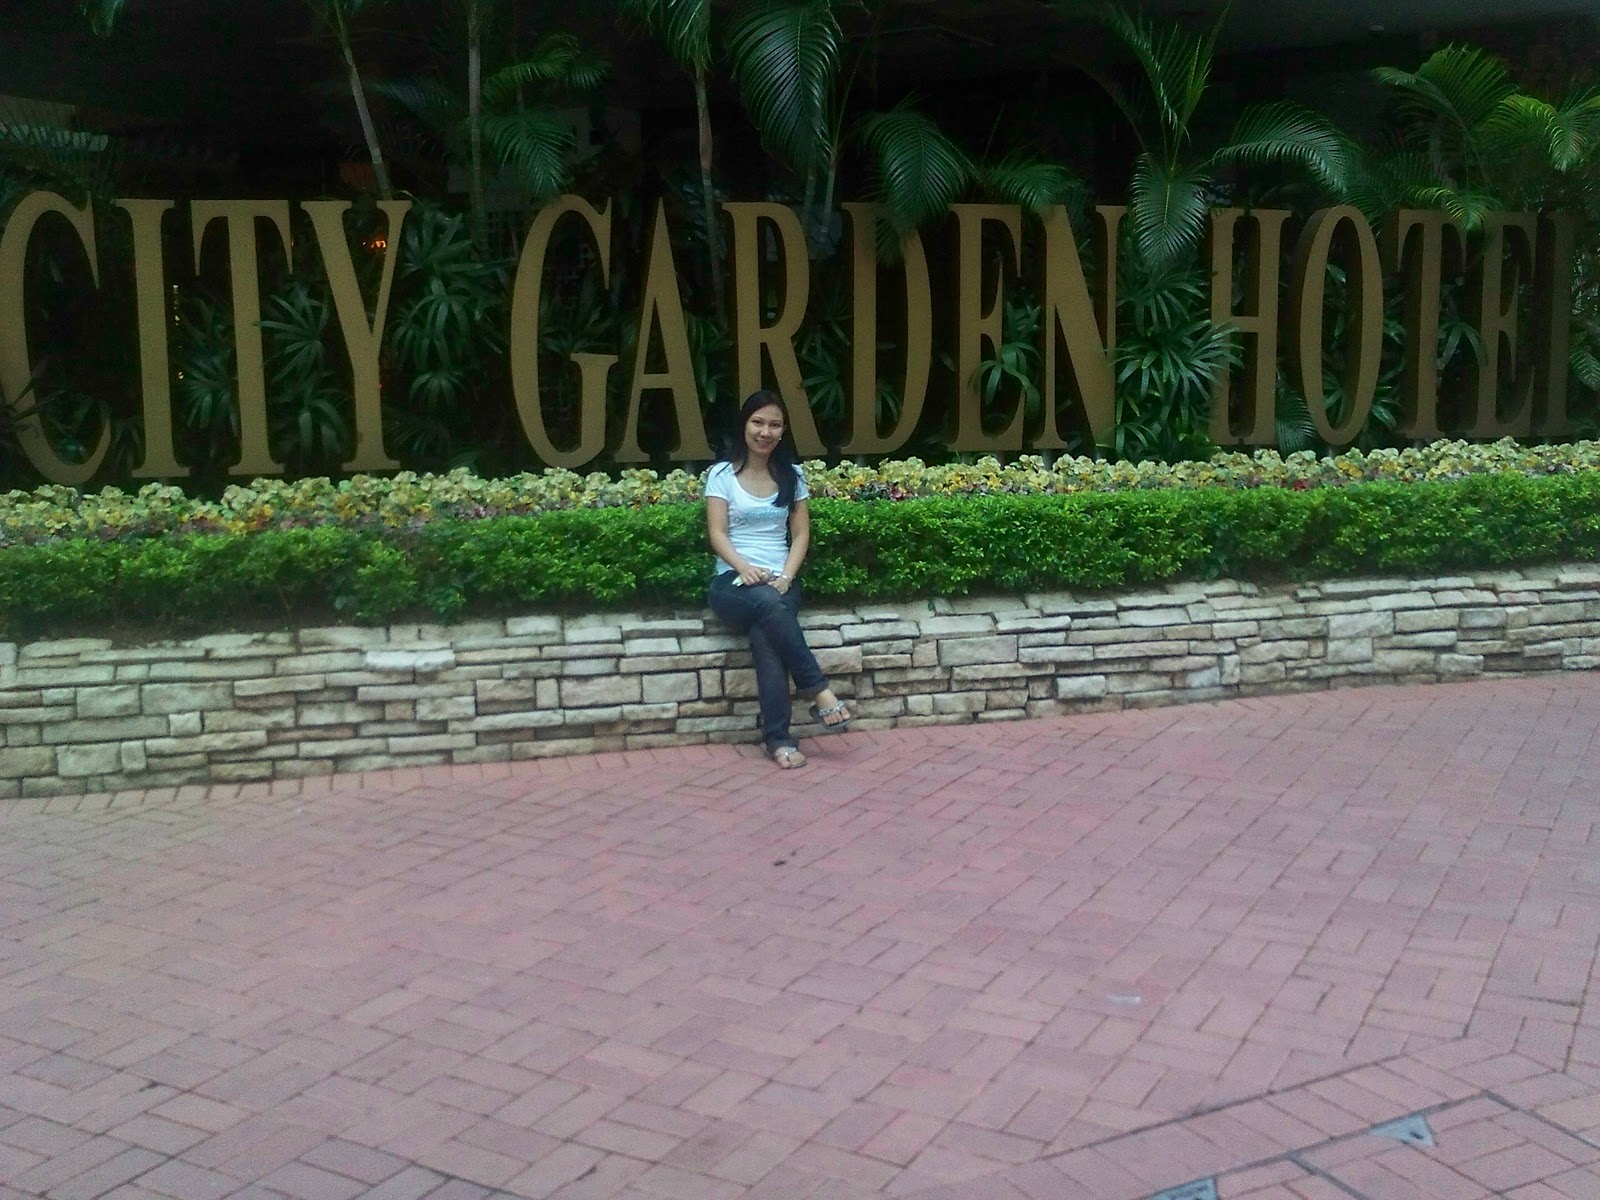 Hong Kong City Garden Hotel